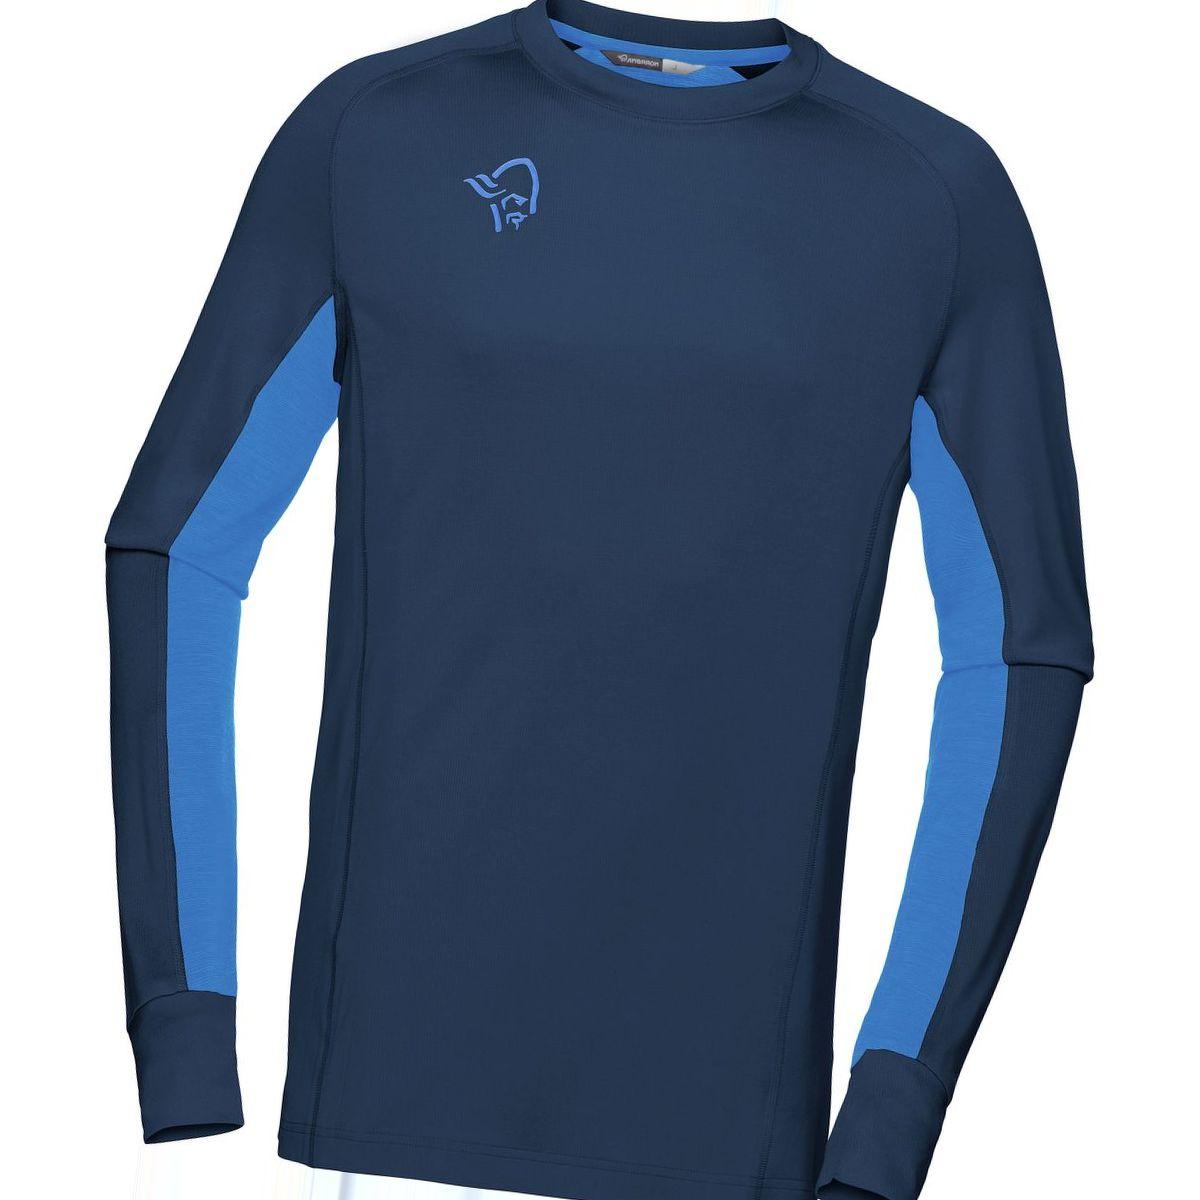 Norrona Fjora Powerwool Long-Sleeve Shirt - Men's